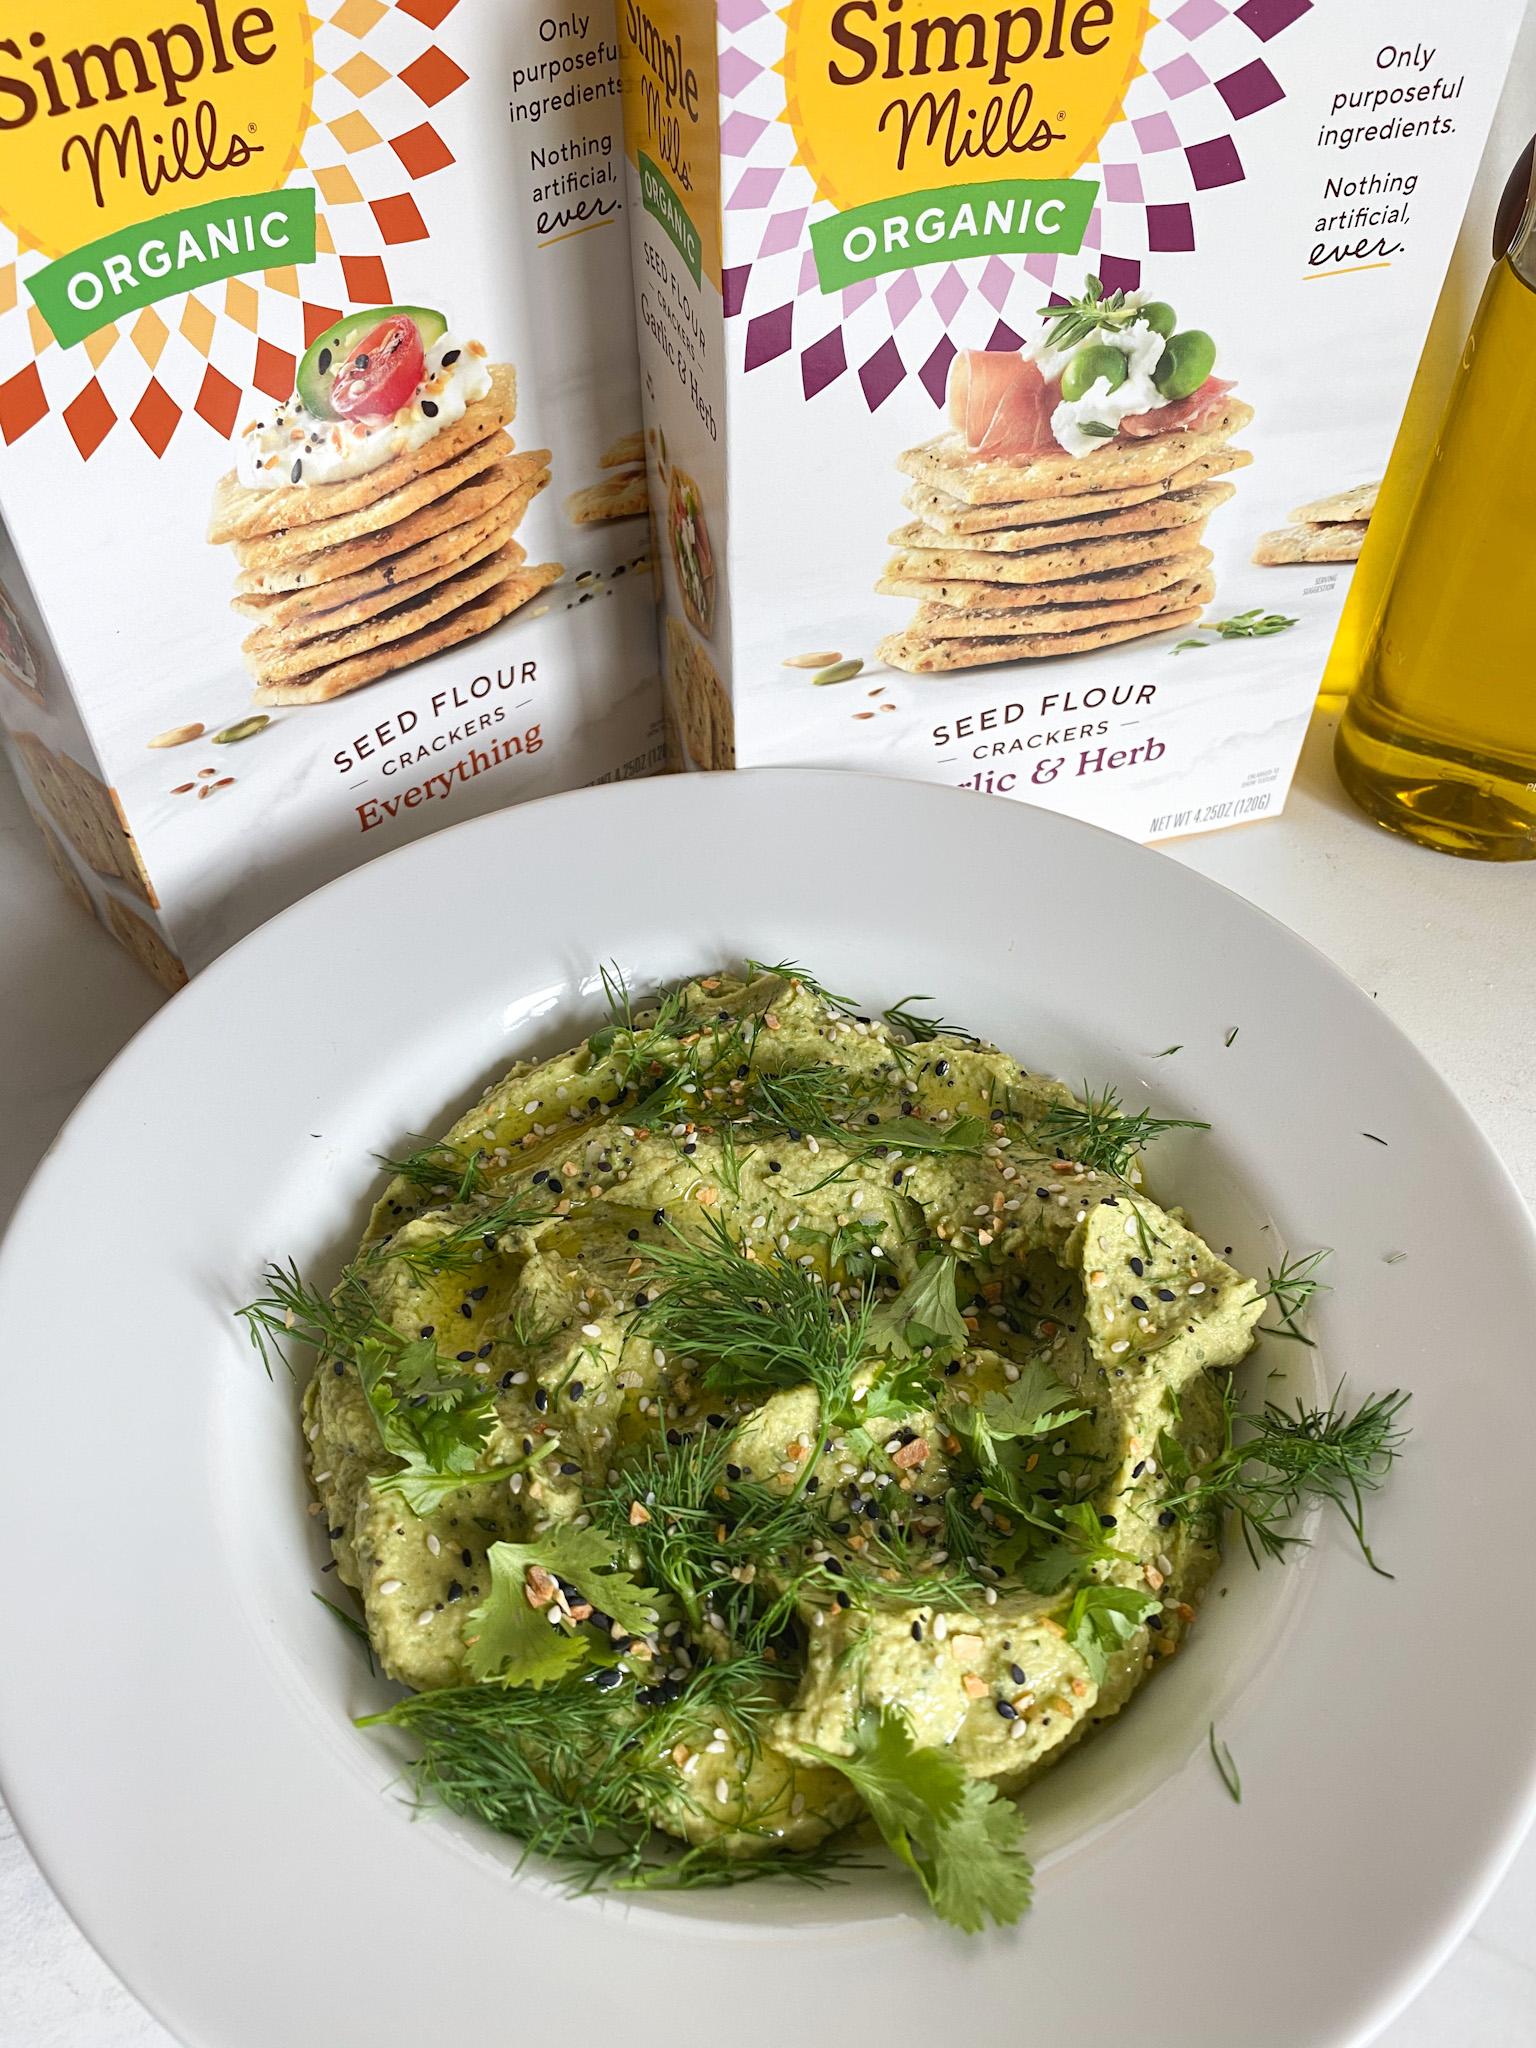 Avocado Hummus with Simple Mills crackers